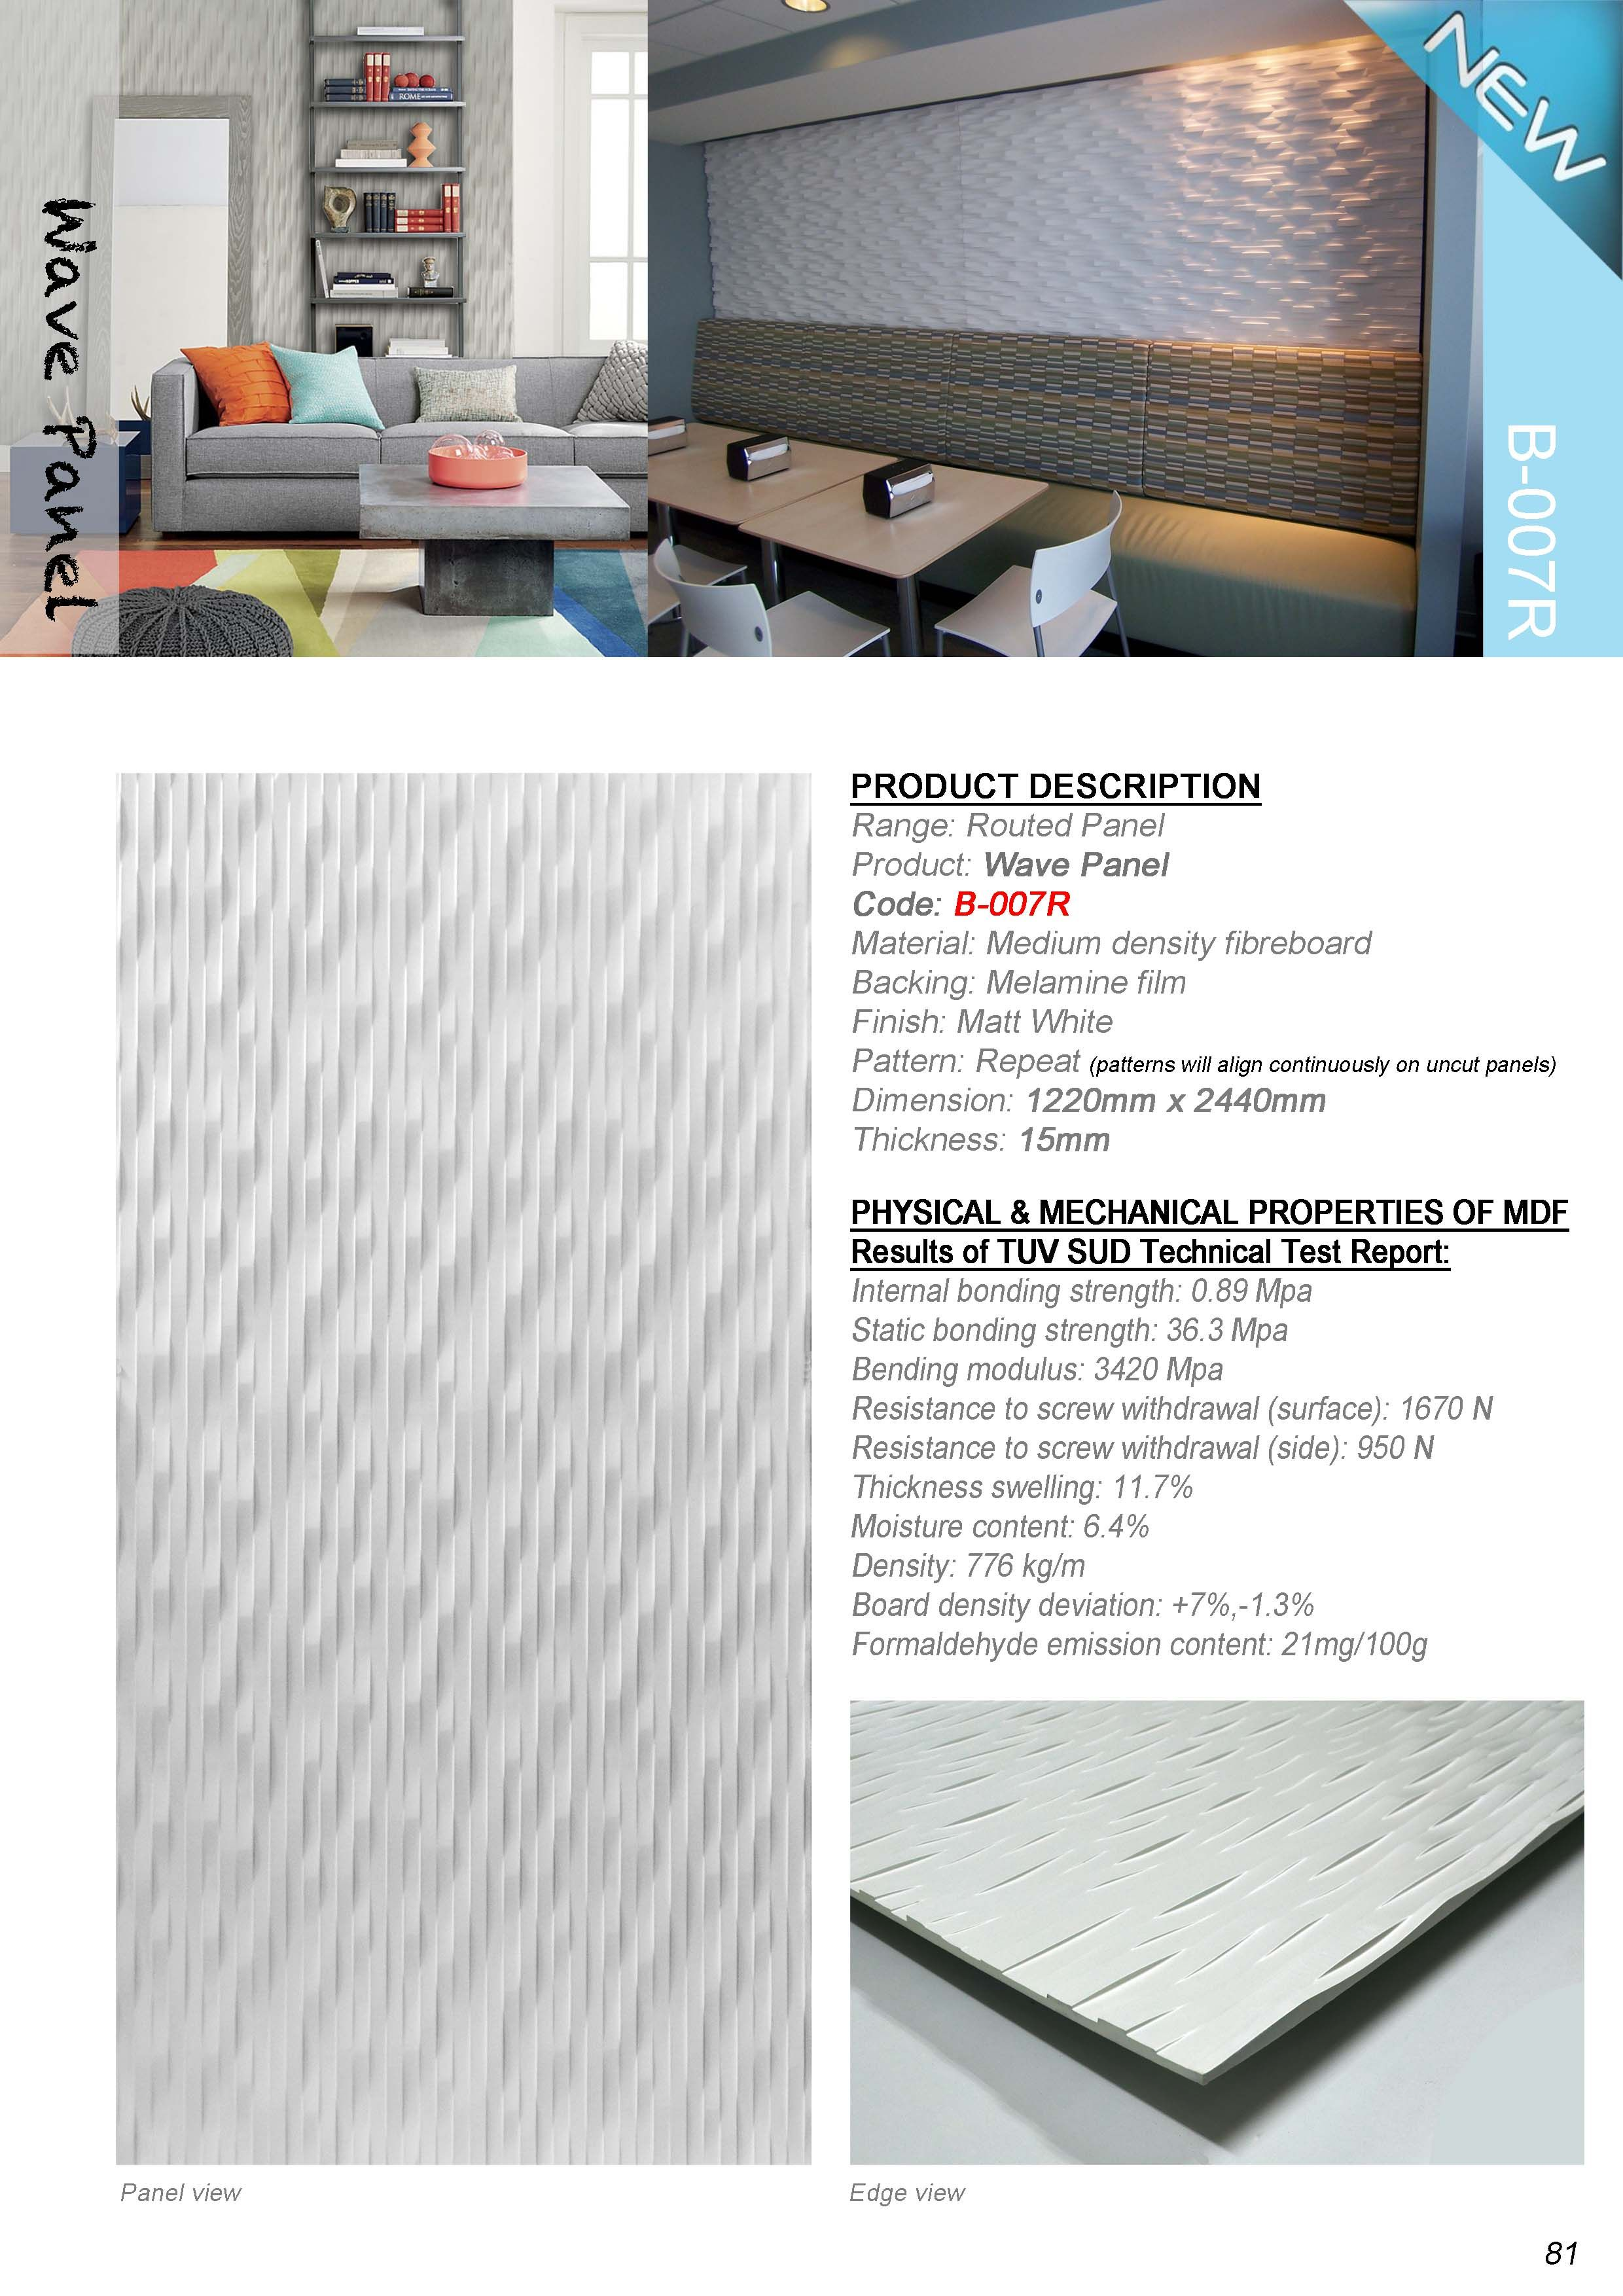 The panels are made of Medium Density Fiberboard (MDF ...